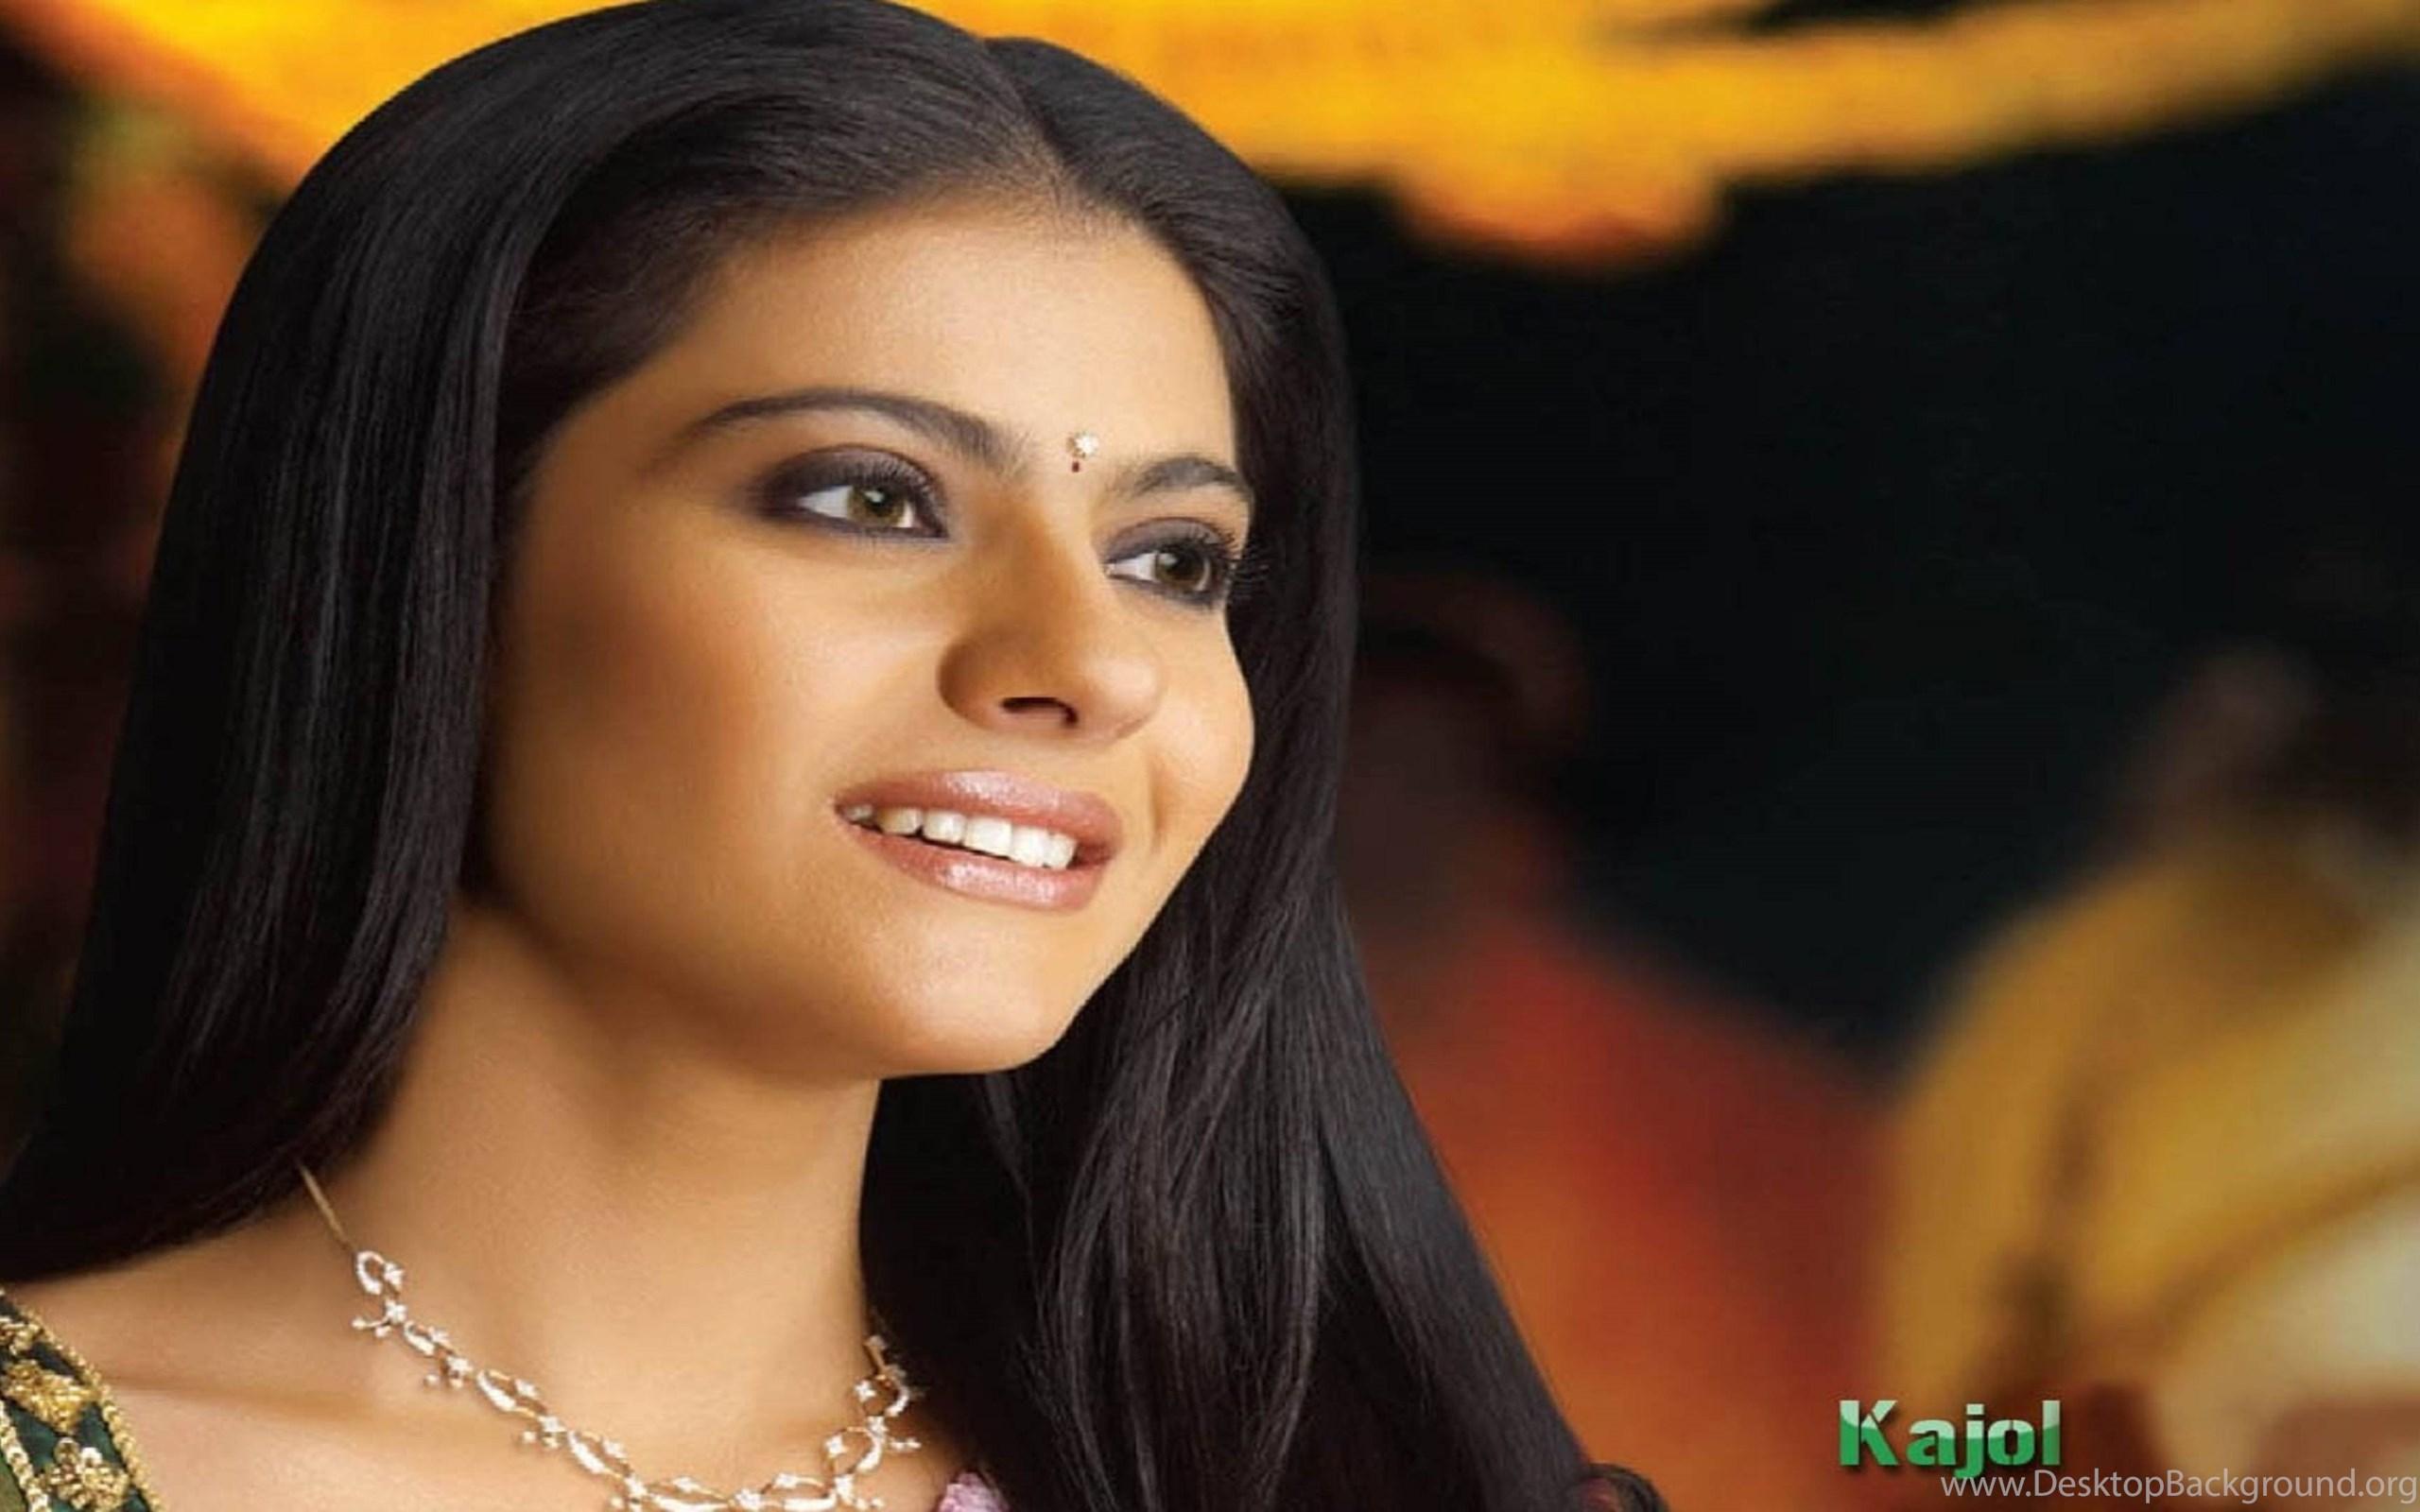 beautiful hot indian actress 4k hd wallpapers (13) desktop background